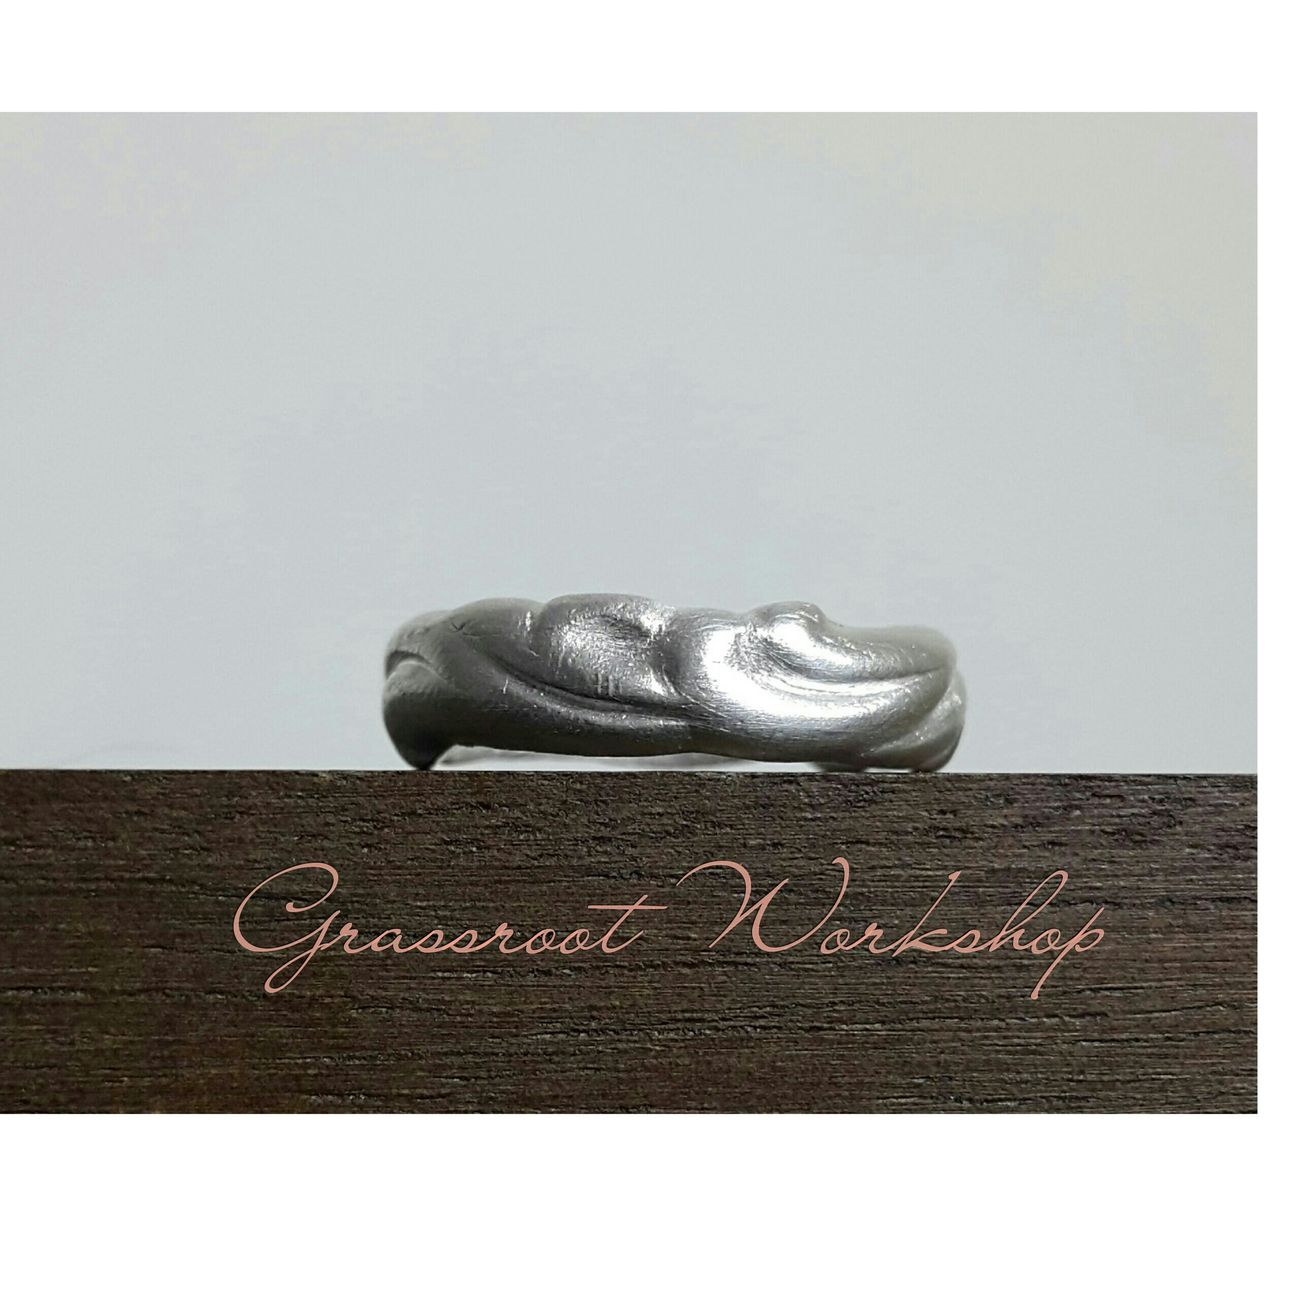 99.9 Silver Clay 純銀黏土 手工藝 手作 Handmade